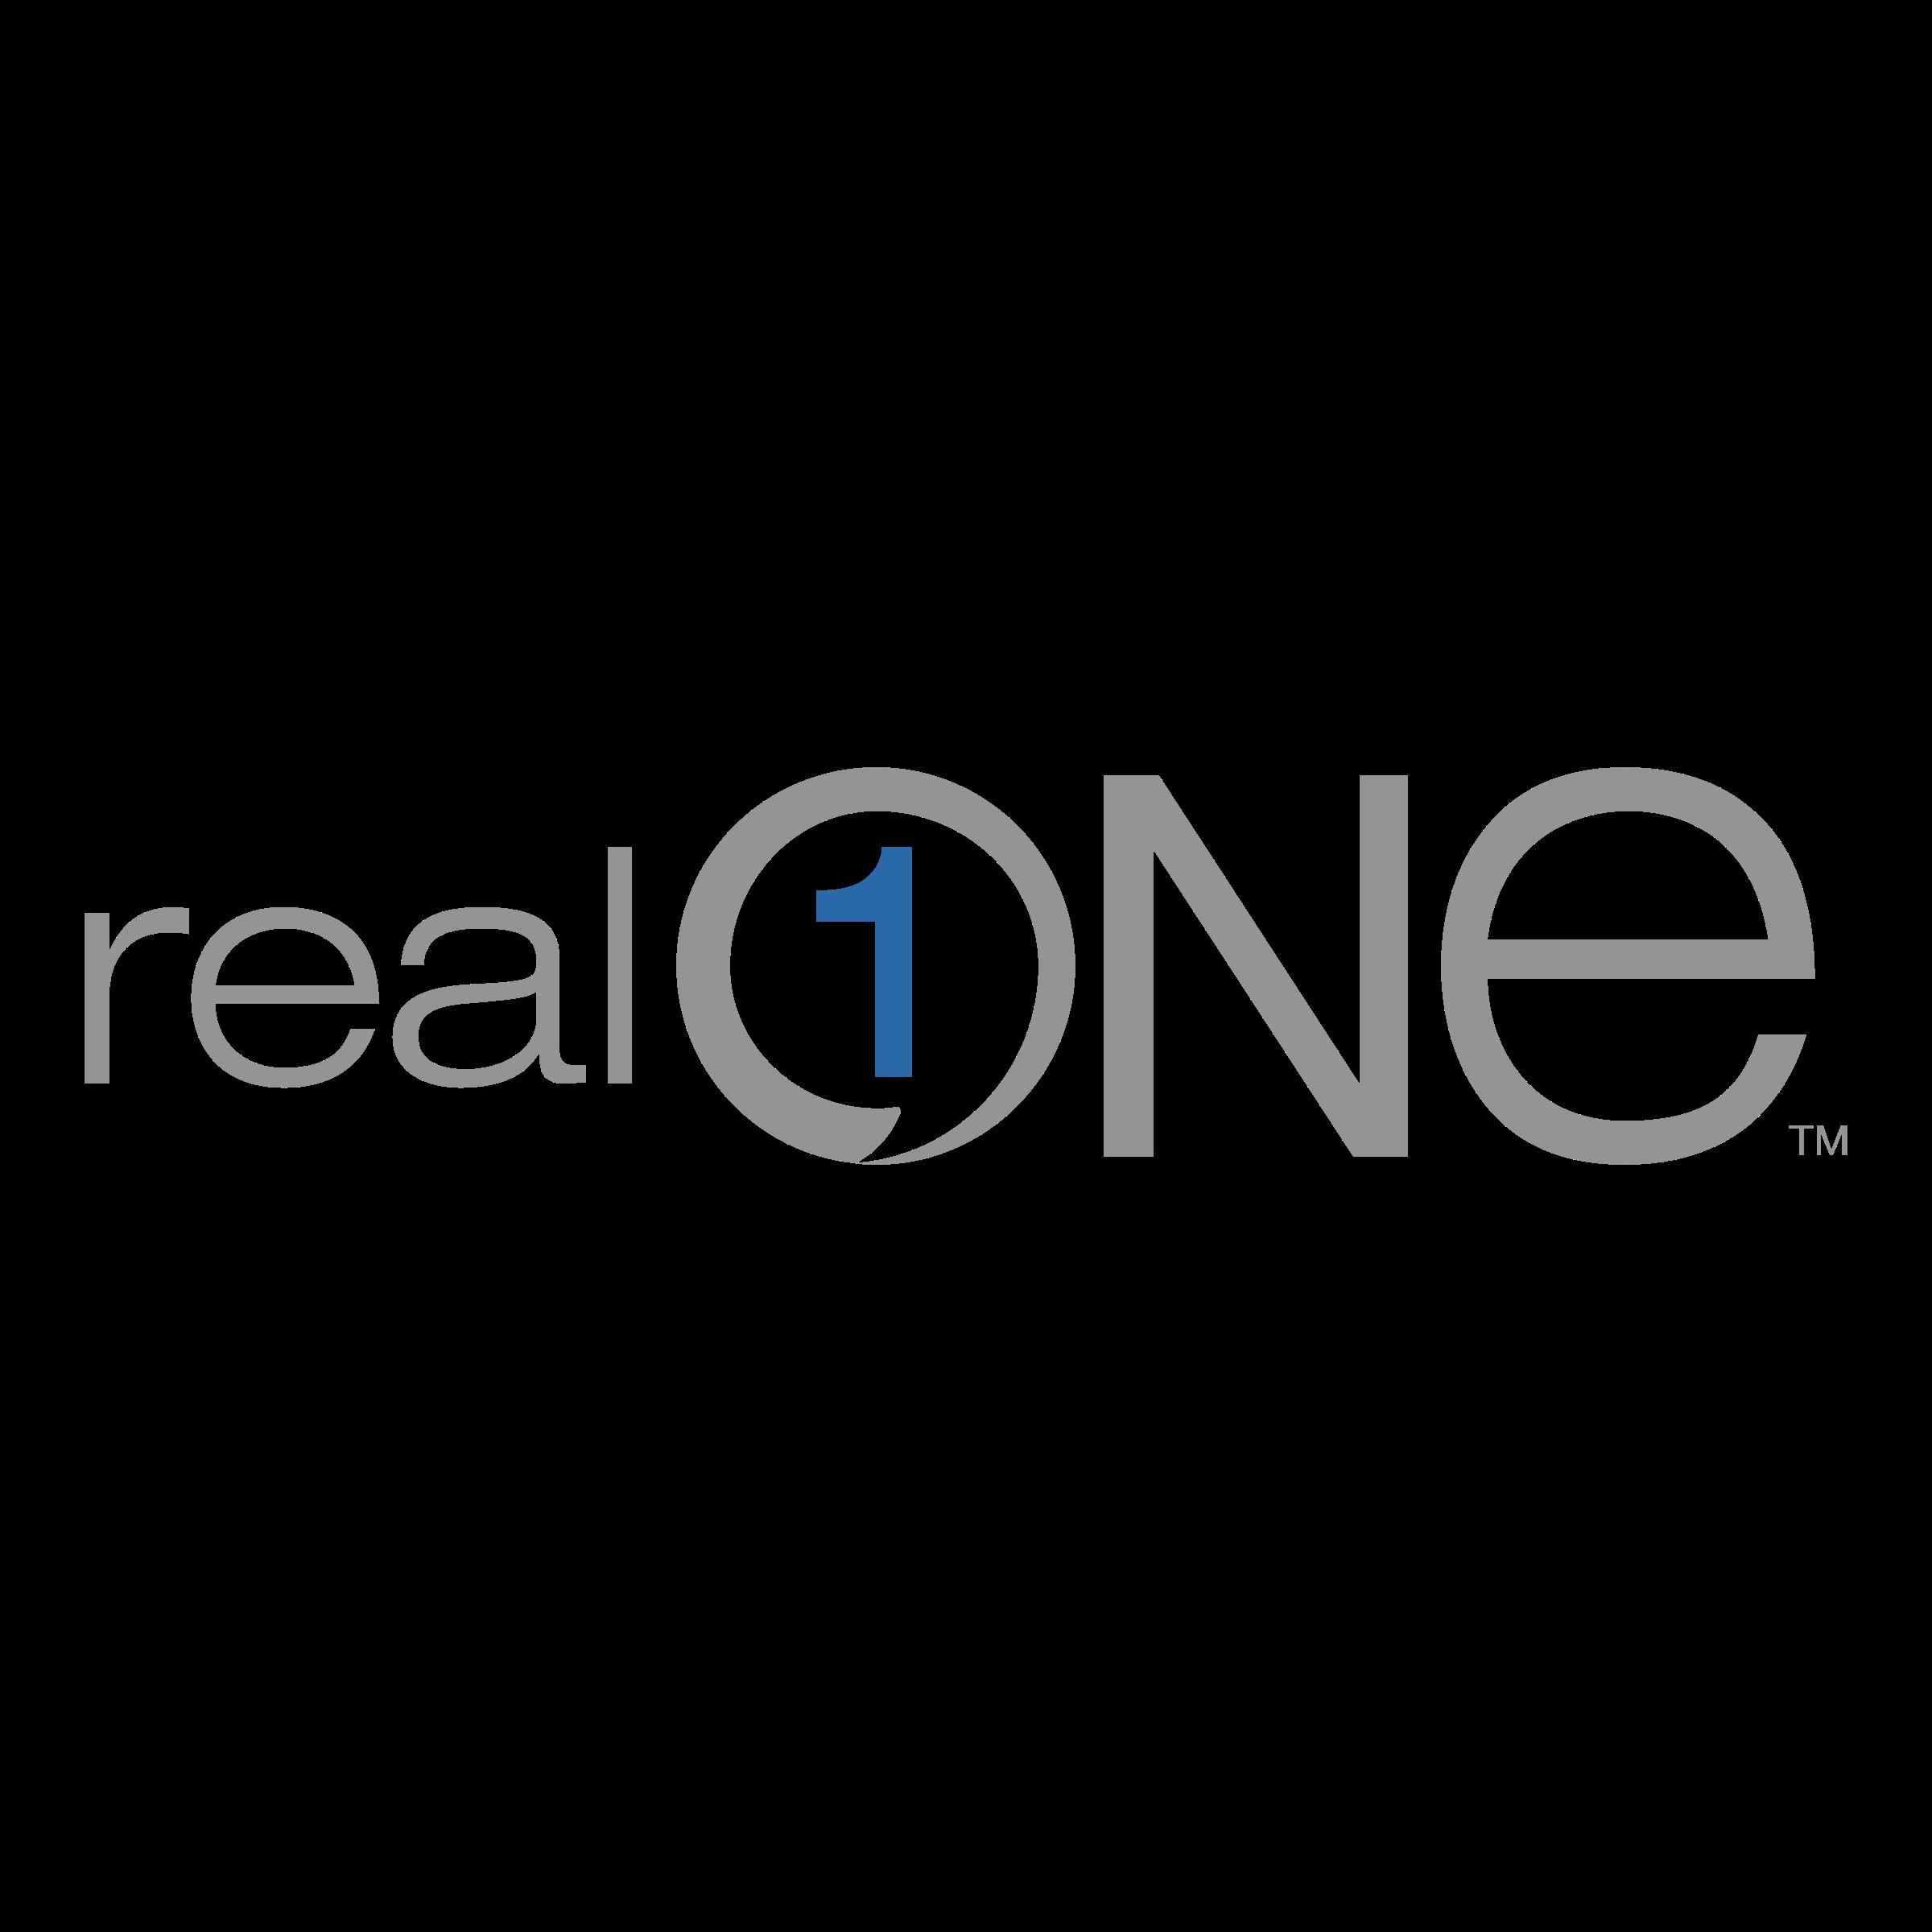 realone